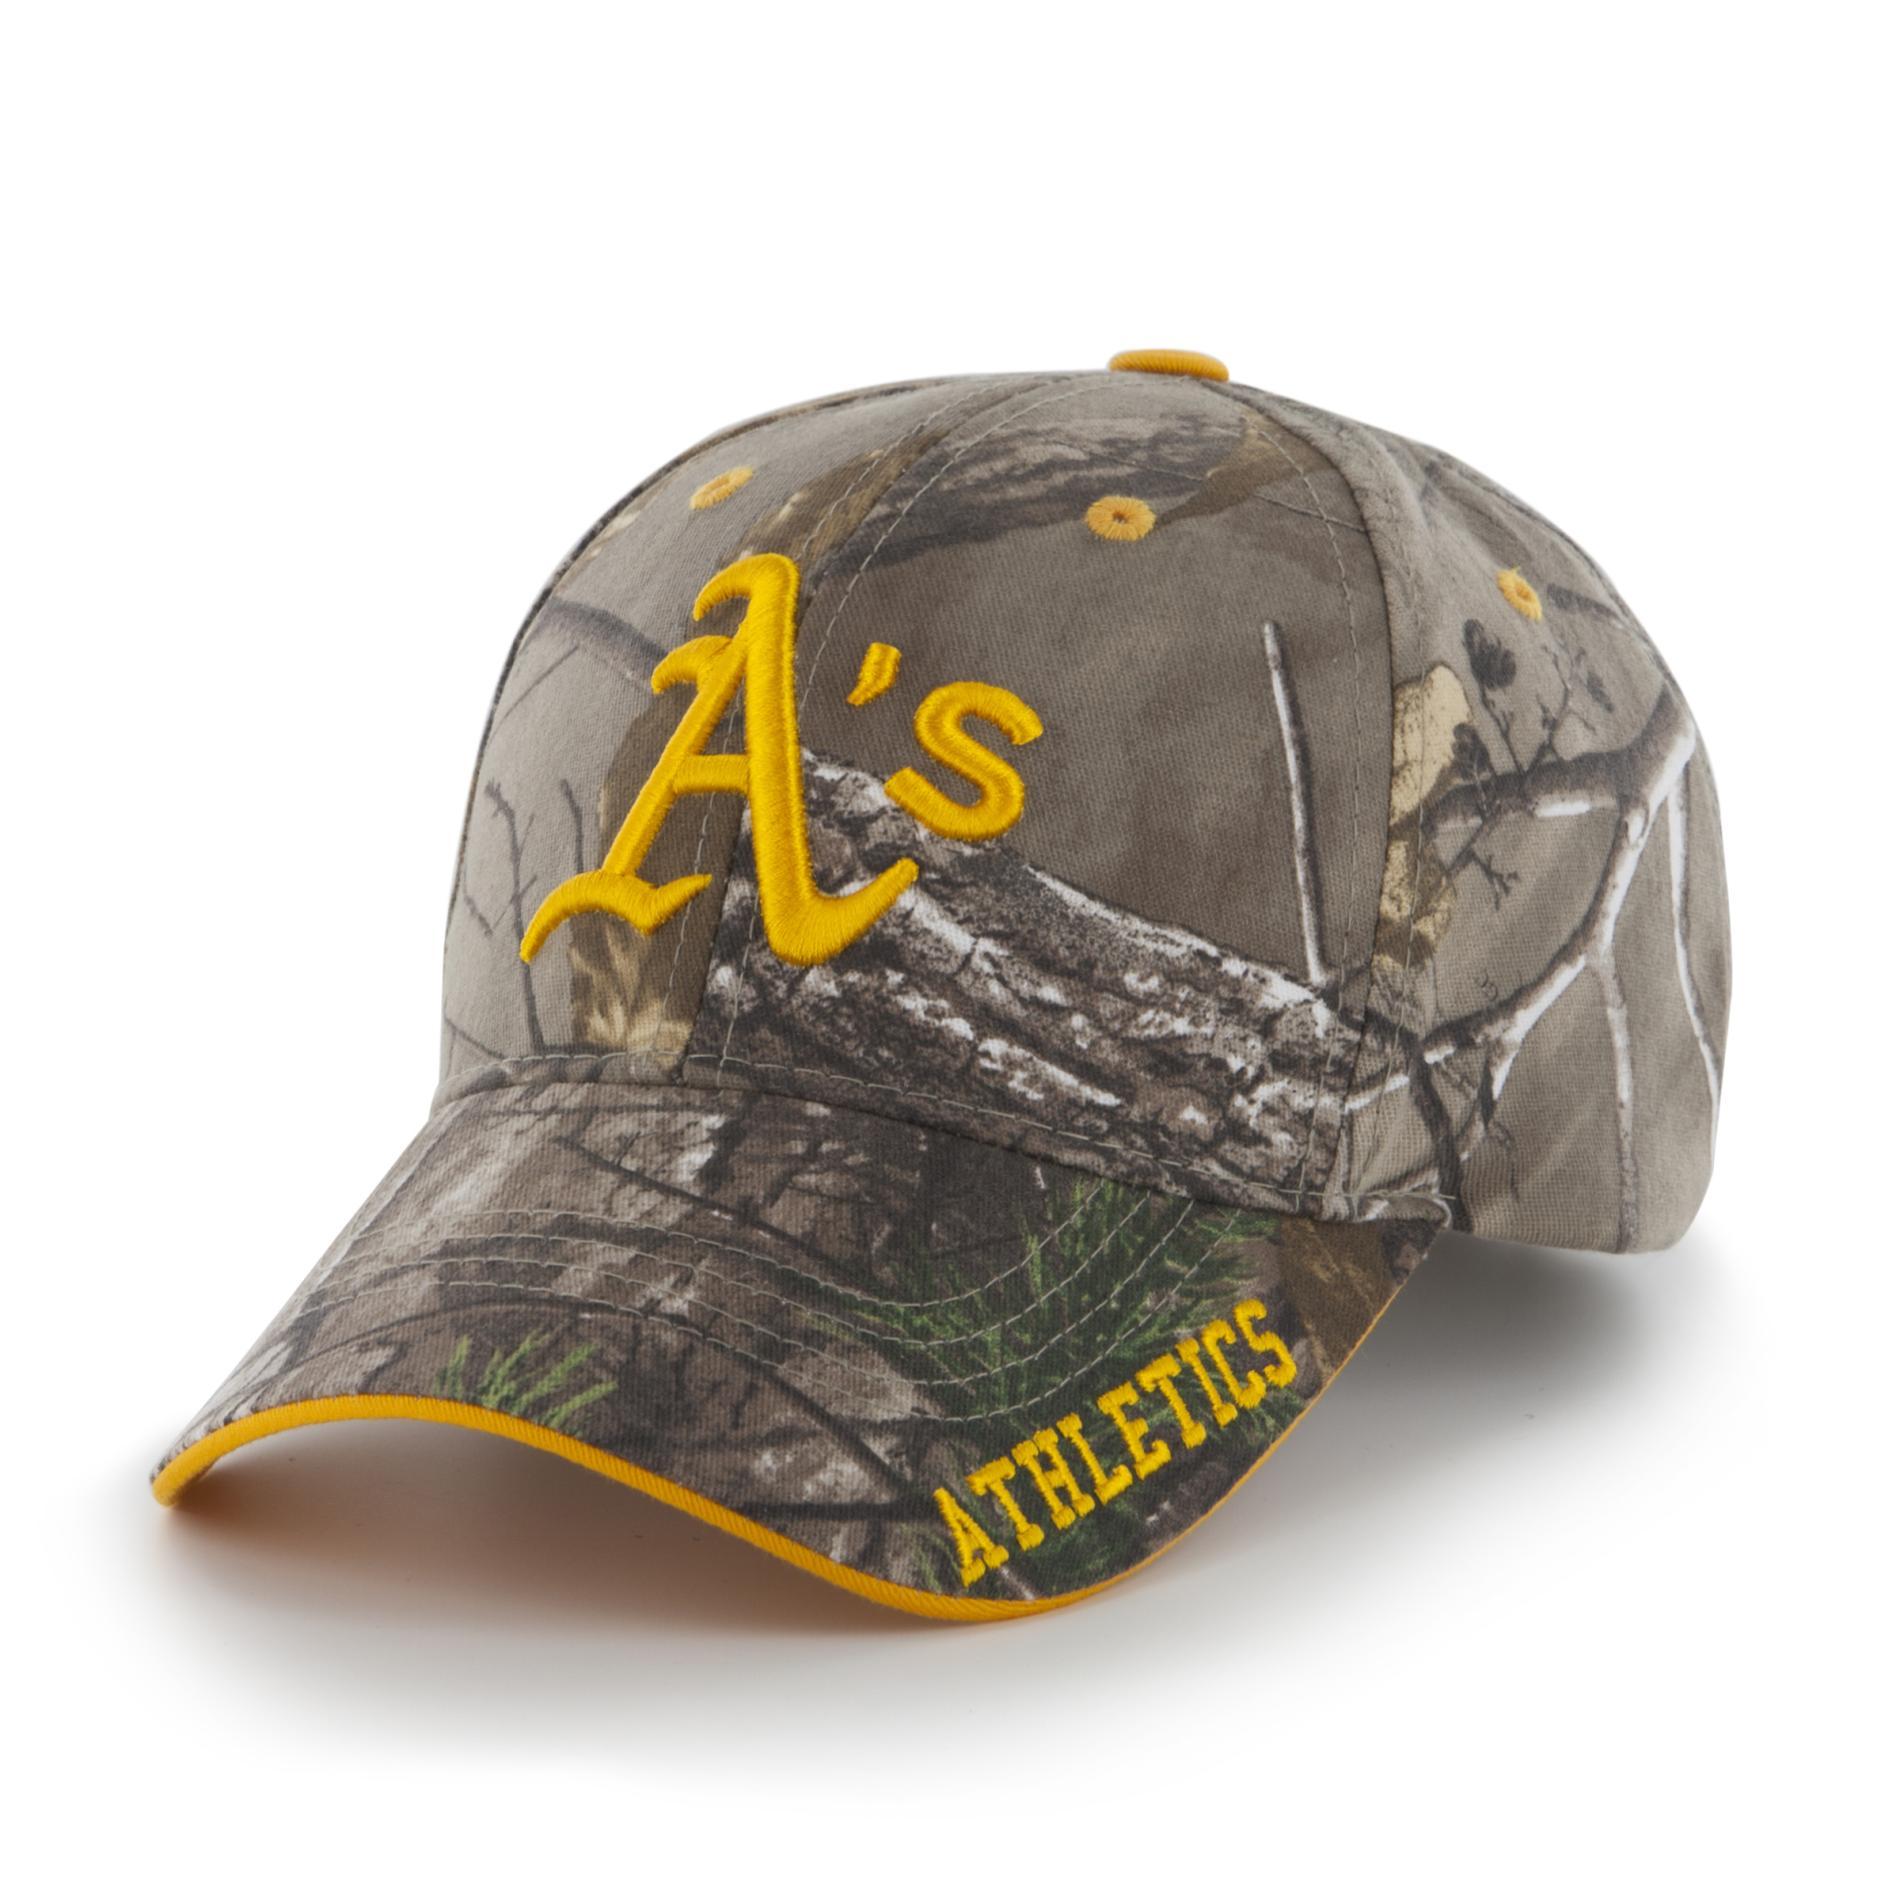 MLB Men's Camouflage Baseball Hat - Oakland Athletics, Green